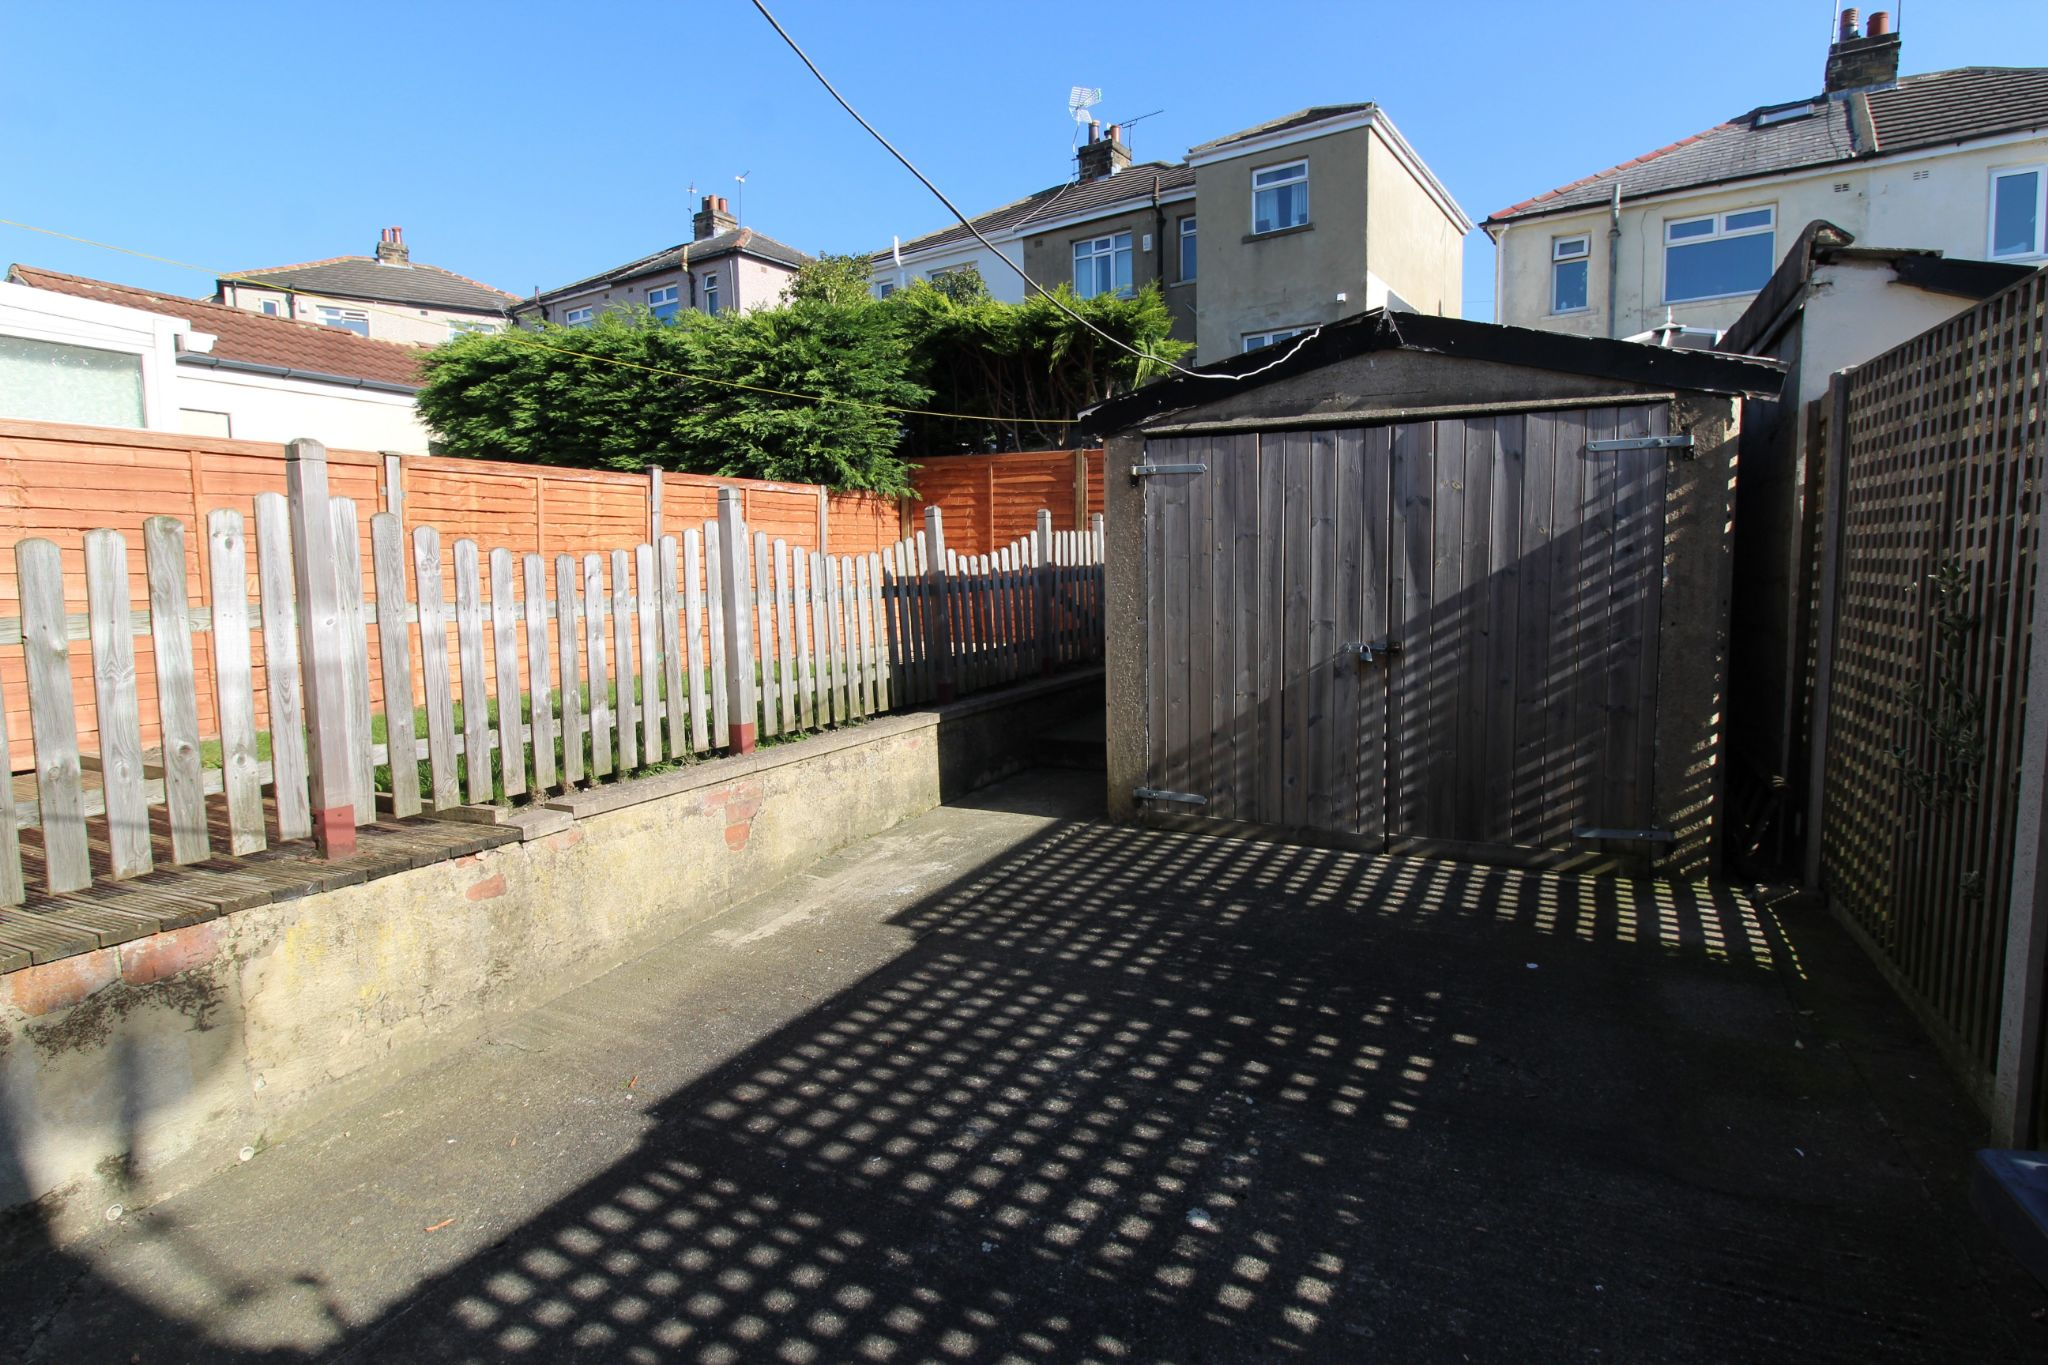 2 bedroom semi-detached house Let in Bradford - Garage